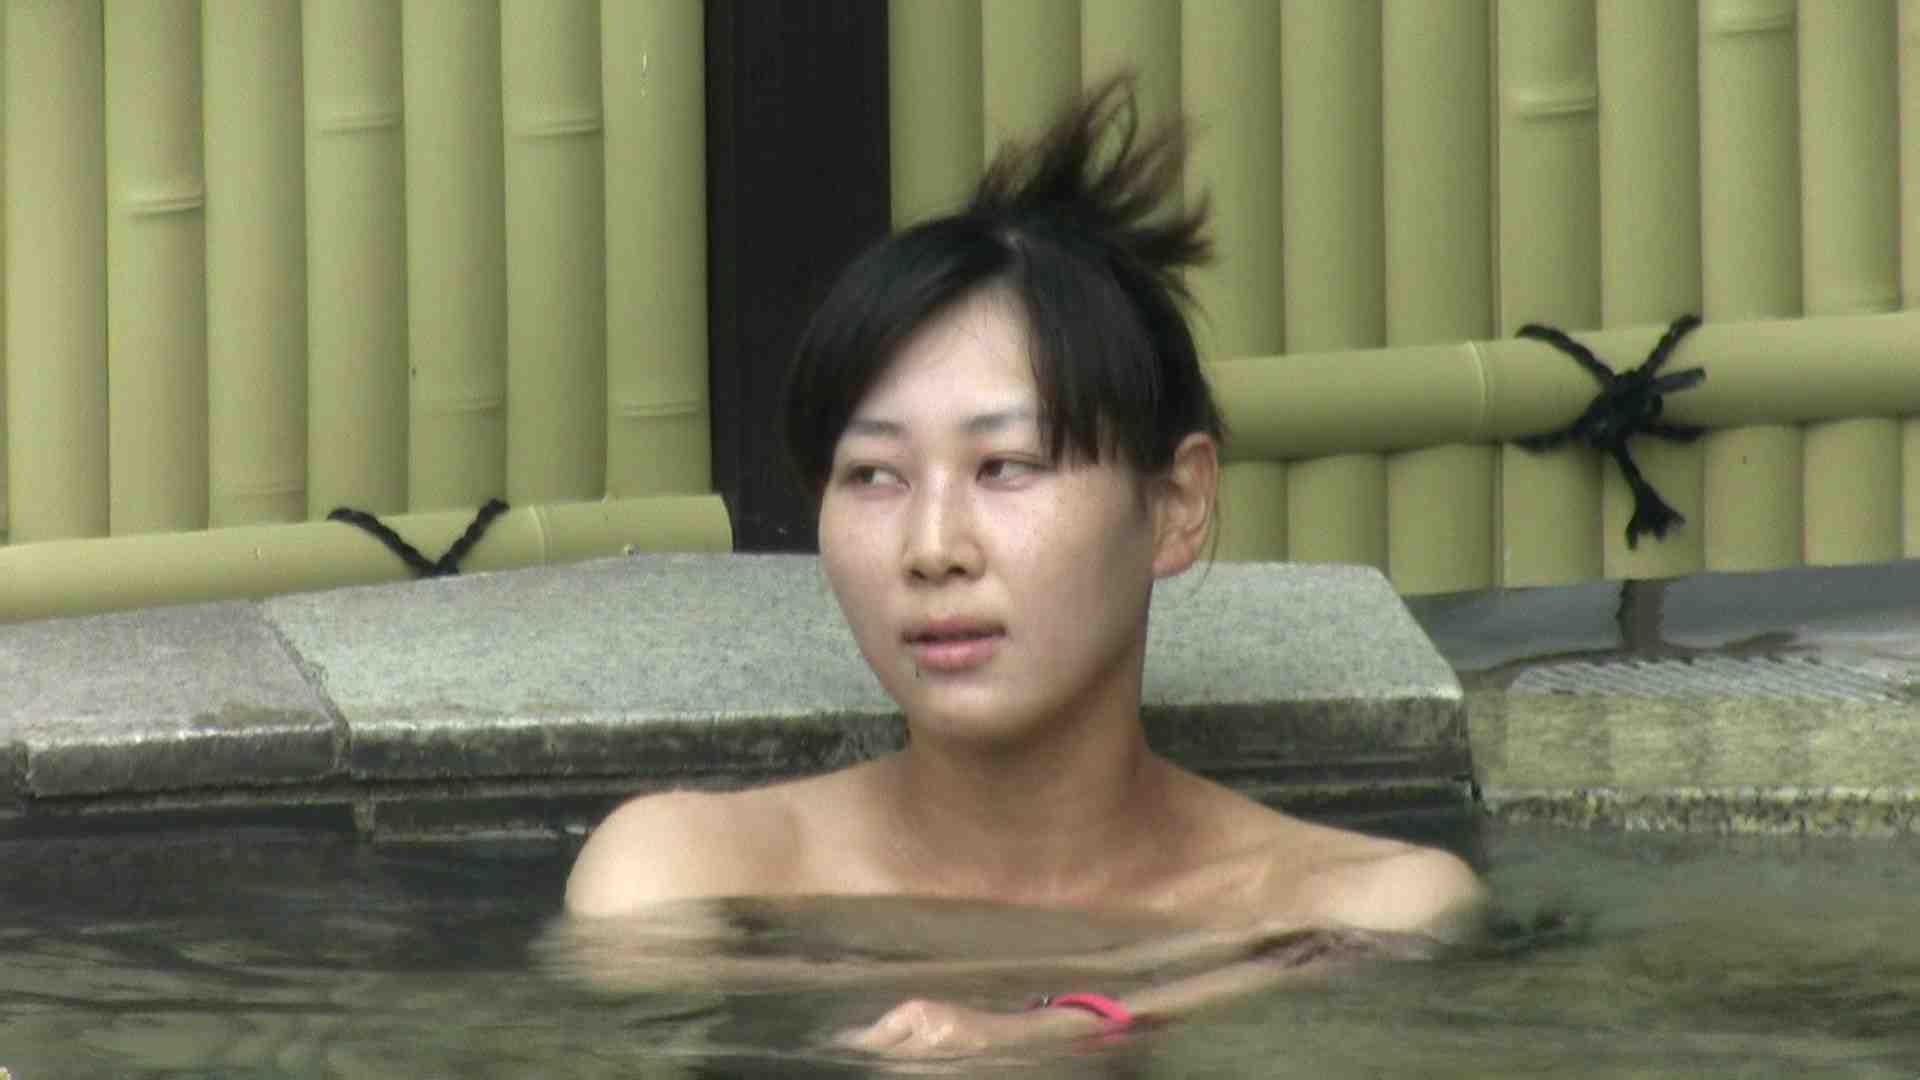 Aquaな露天風呂Vol.665 露天風呂編   盗撮シリーズ  86PIX 49